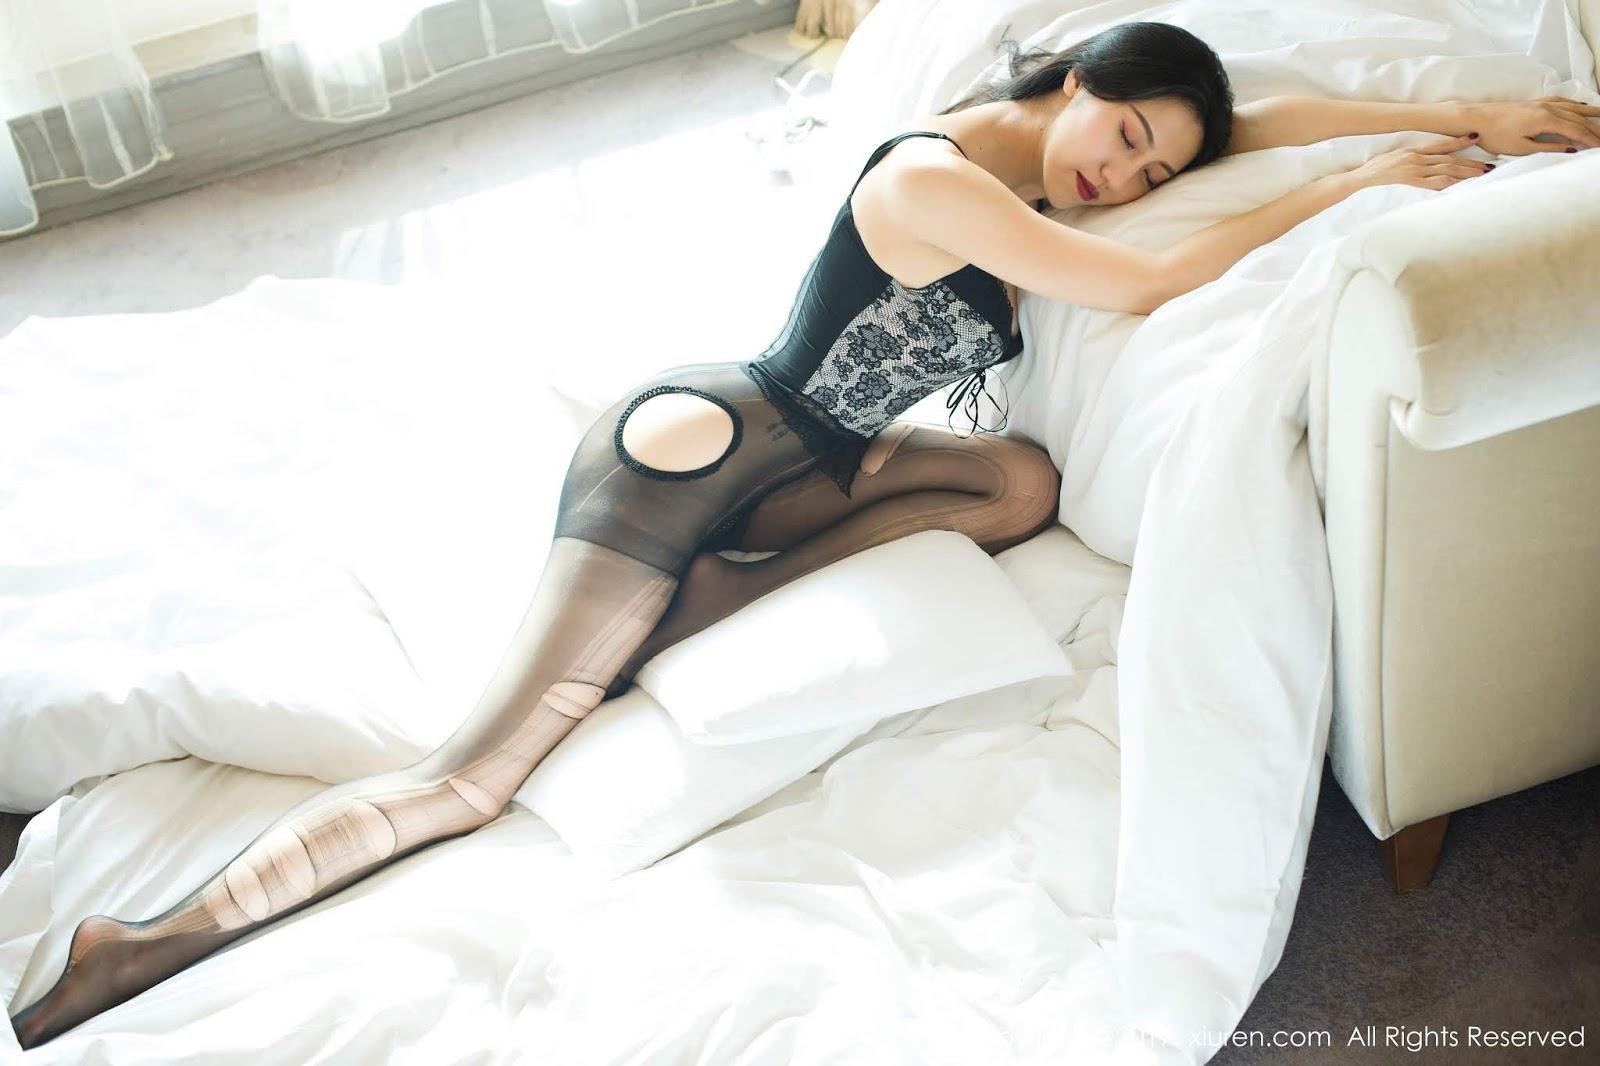 Asian Babe Wang Rui Black Dress and Bikini - Asian Hot